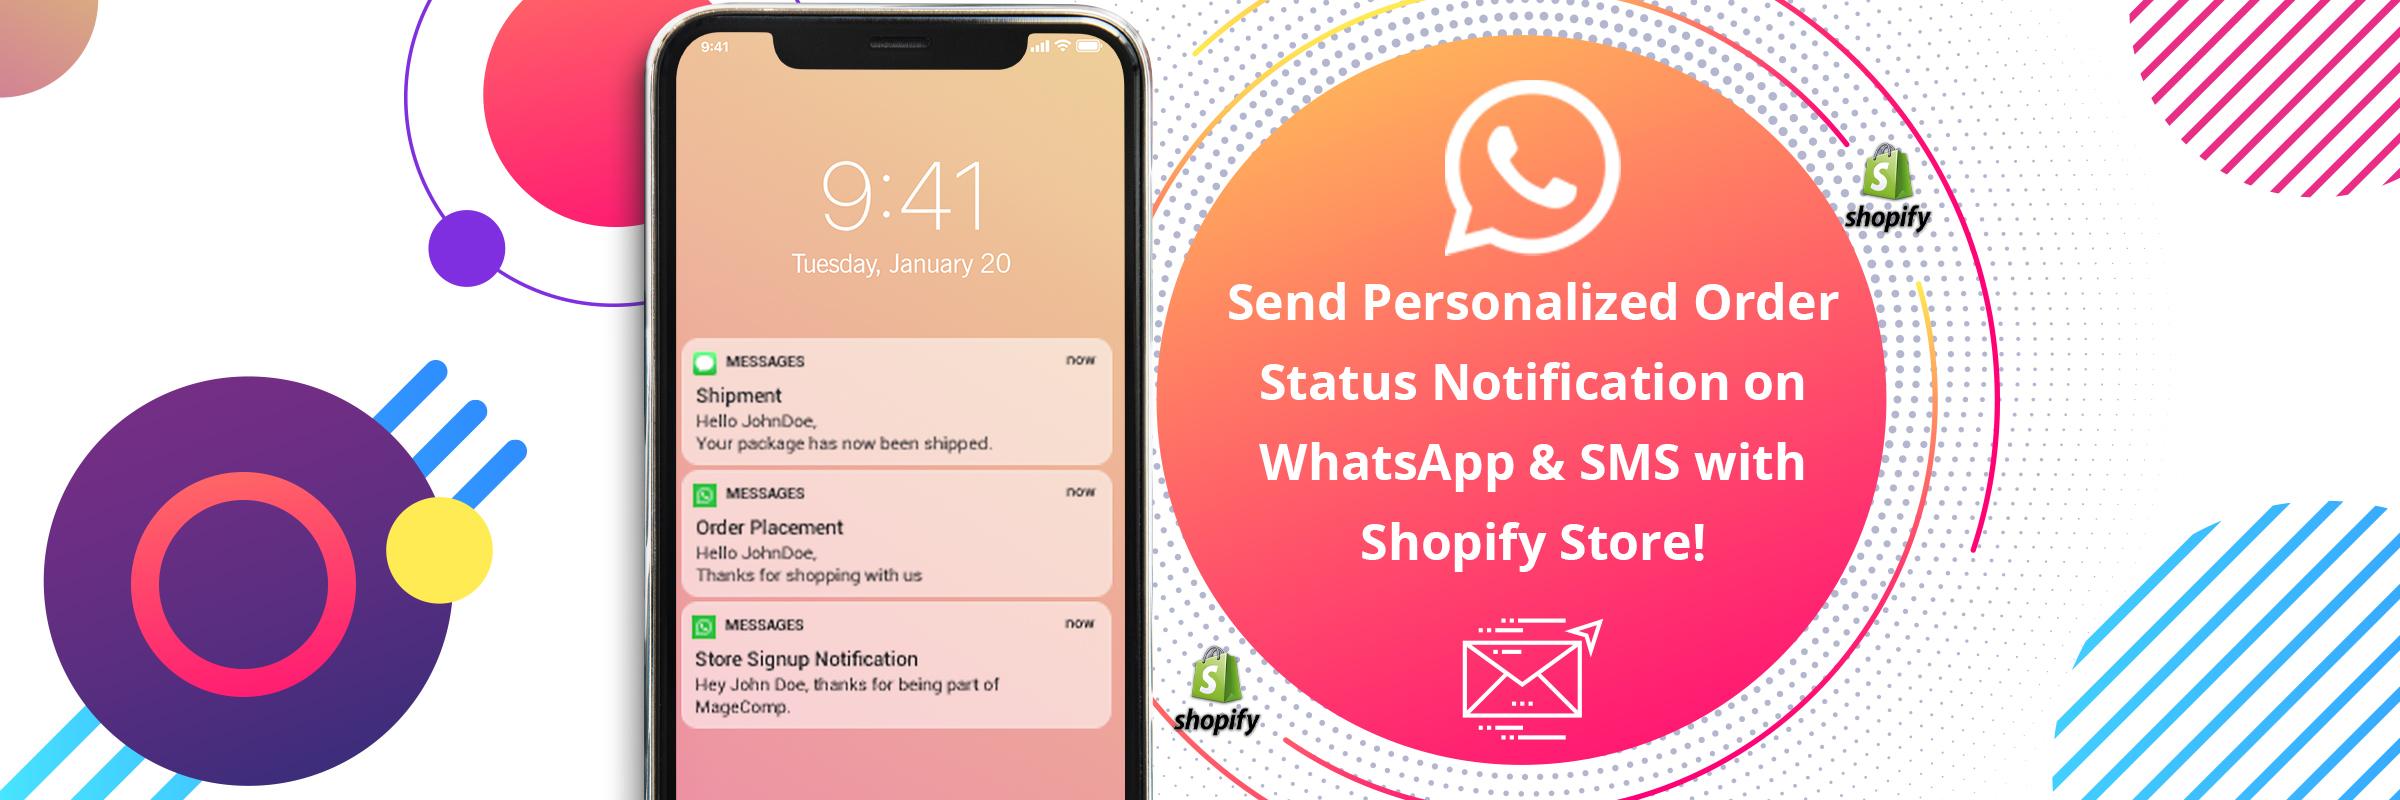 Shopify SMS